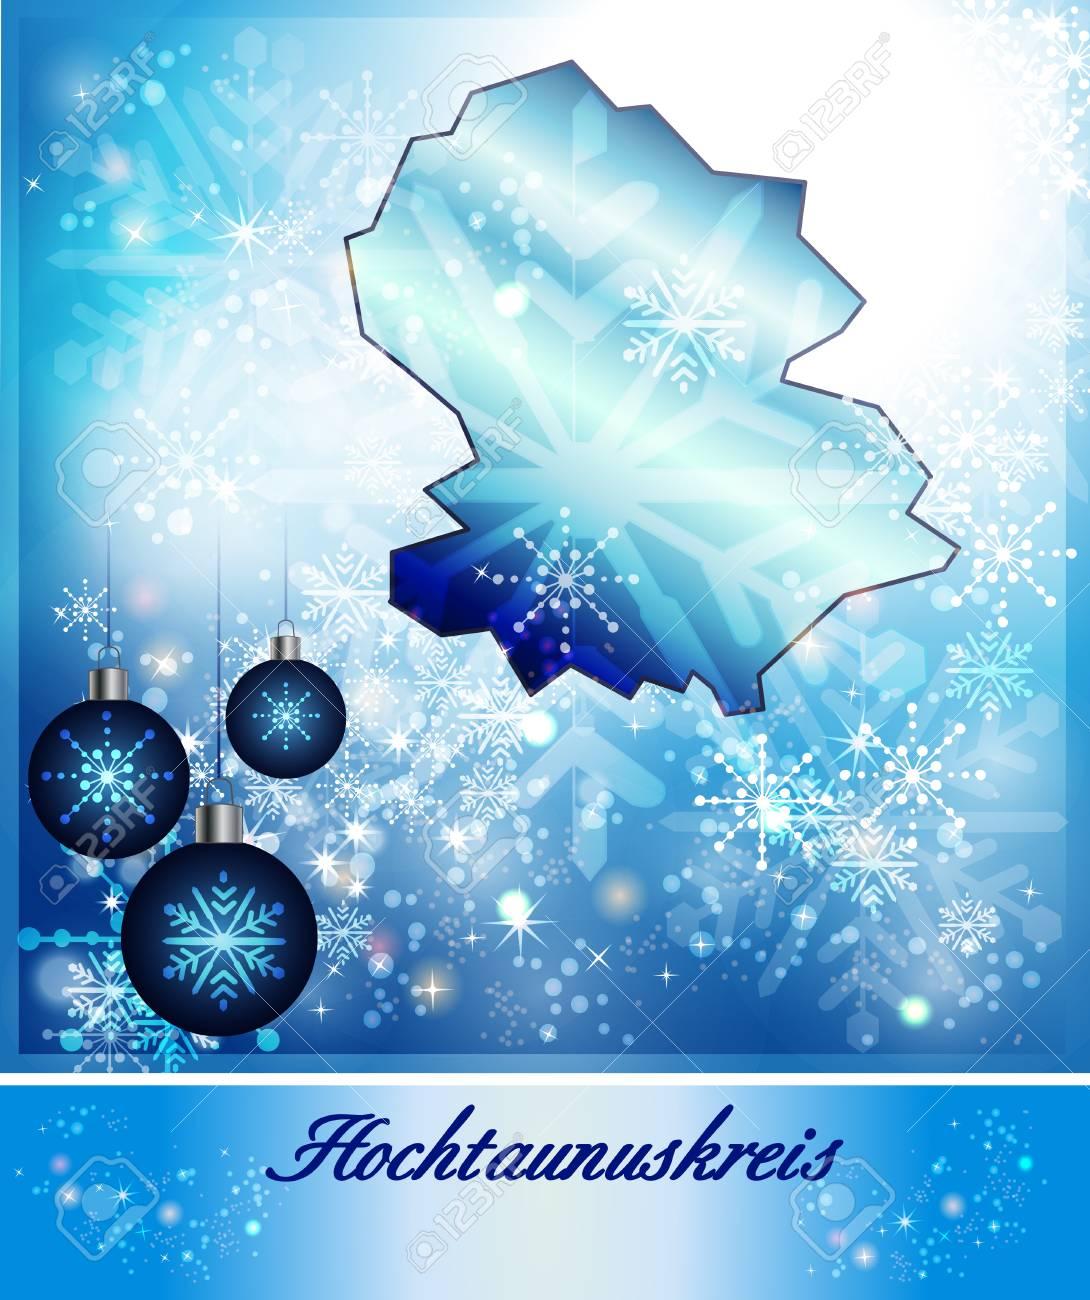 Map Of Hochtaunuskreis In Christmas Design In Blue Stock Photo